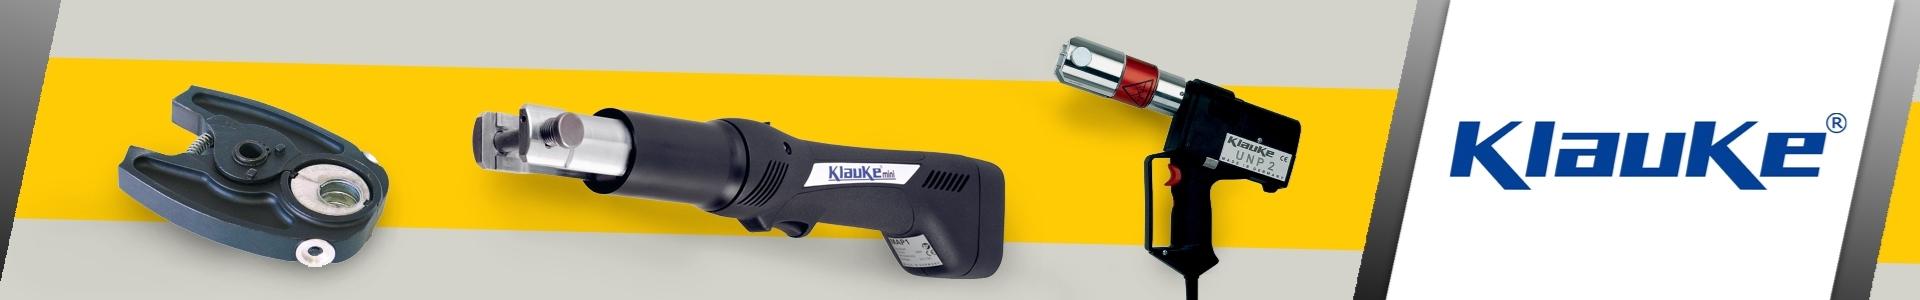 Picture of KLAUKE German Pressing Tools